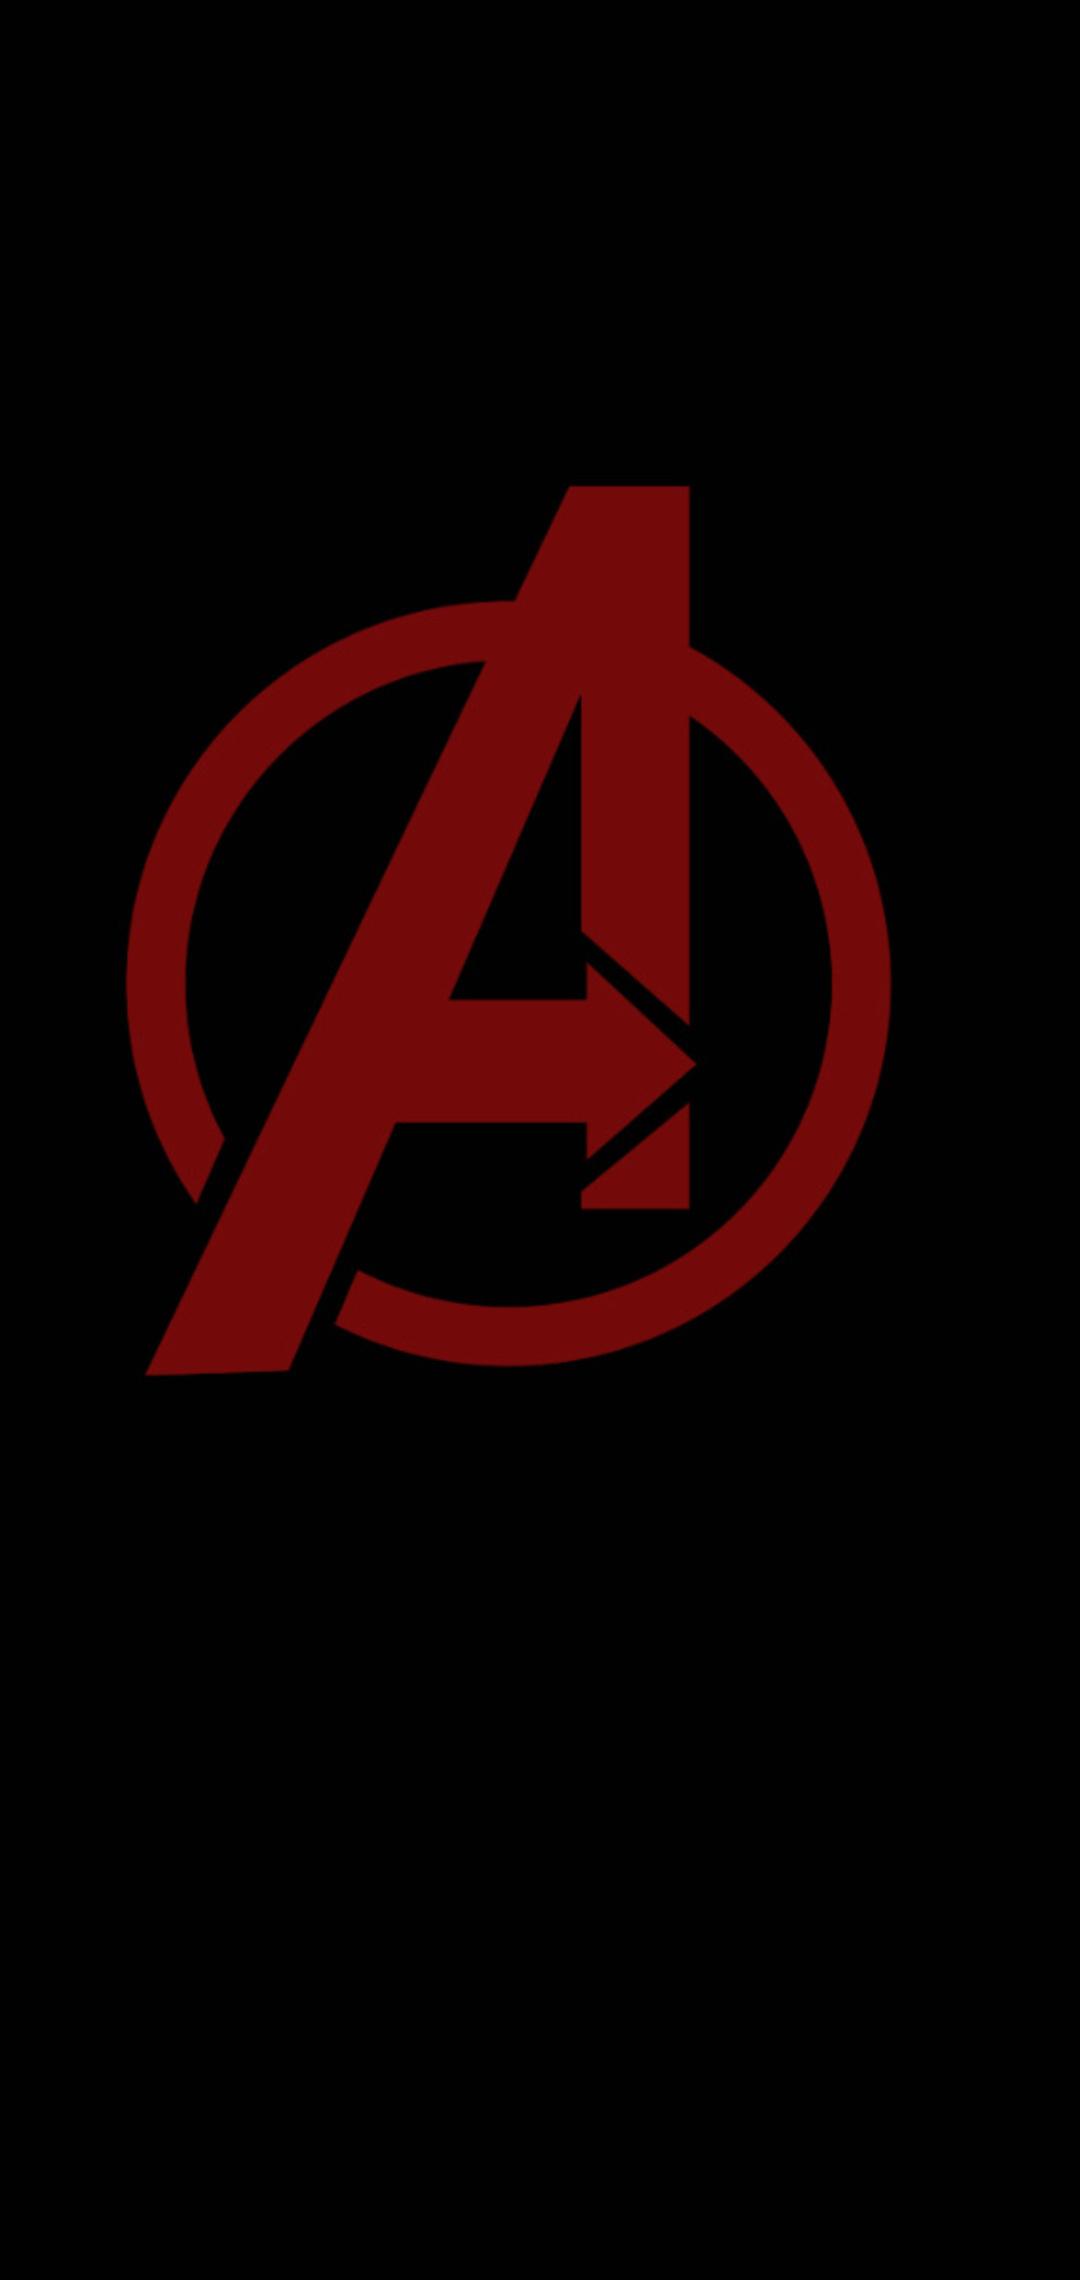 1080x2280 Avengers Minimal Logo One Plus 6huawei P20honor View 10